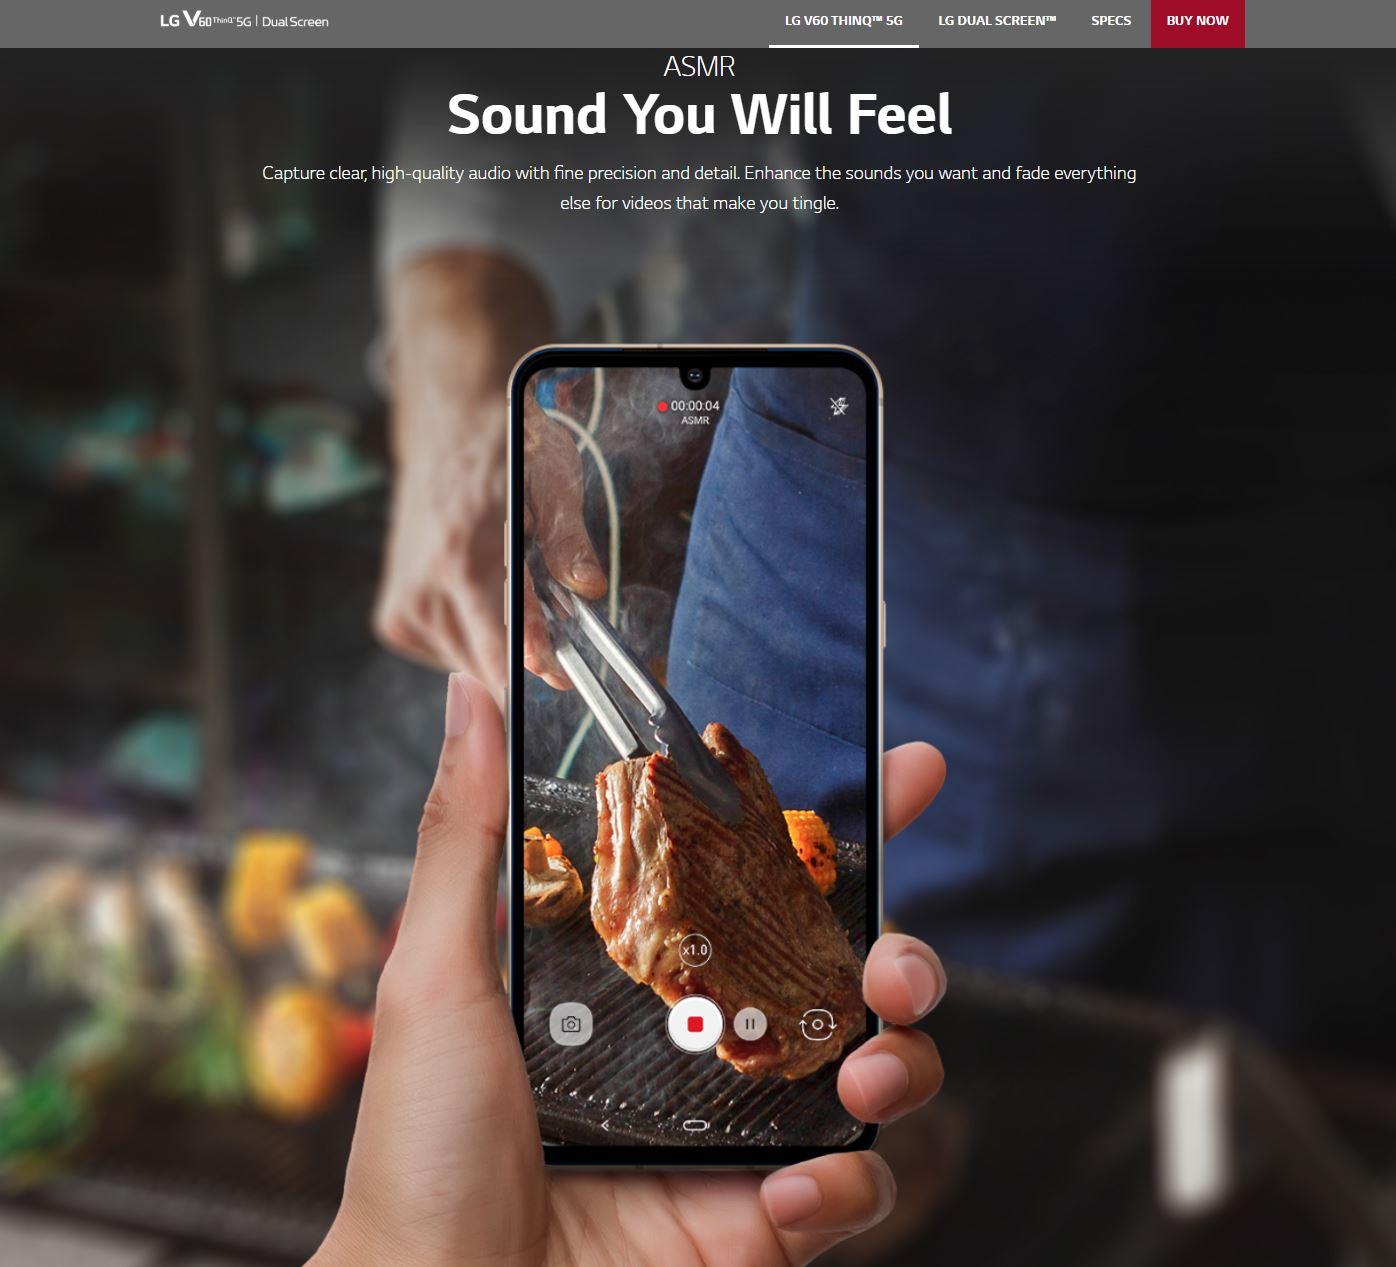 2020-03-26 09_23_44-LG V60 ThinQ 5G Dual Screen Smartphone – Buy Now _ LG USA.jpg